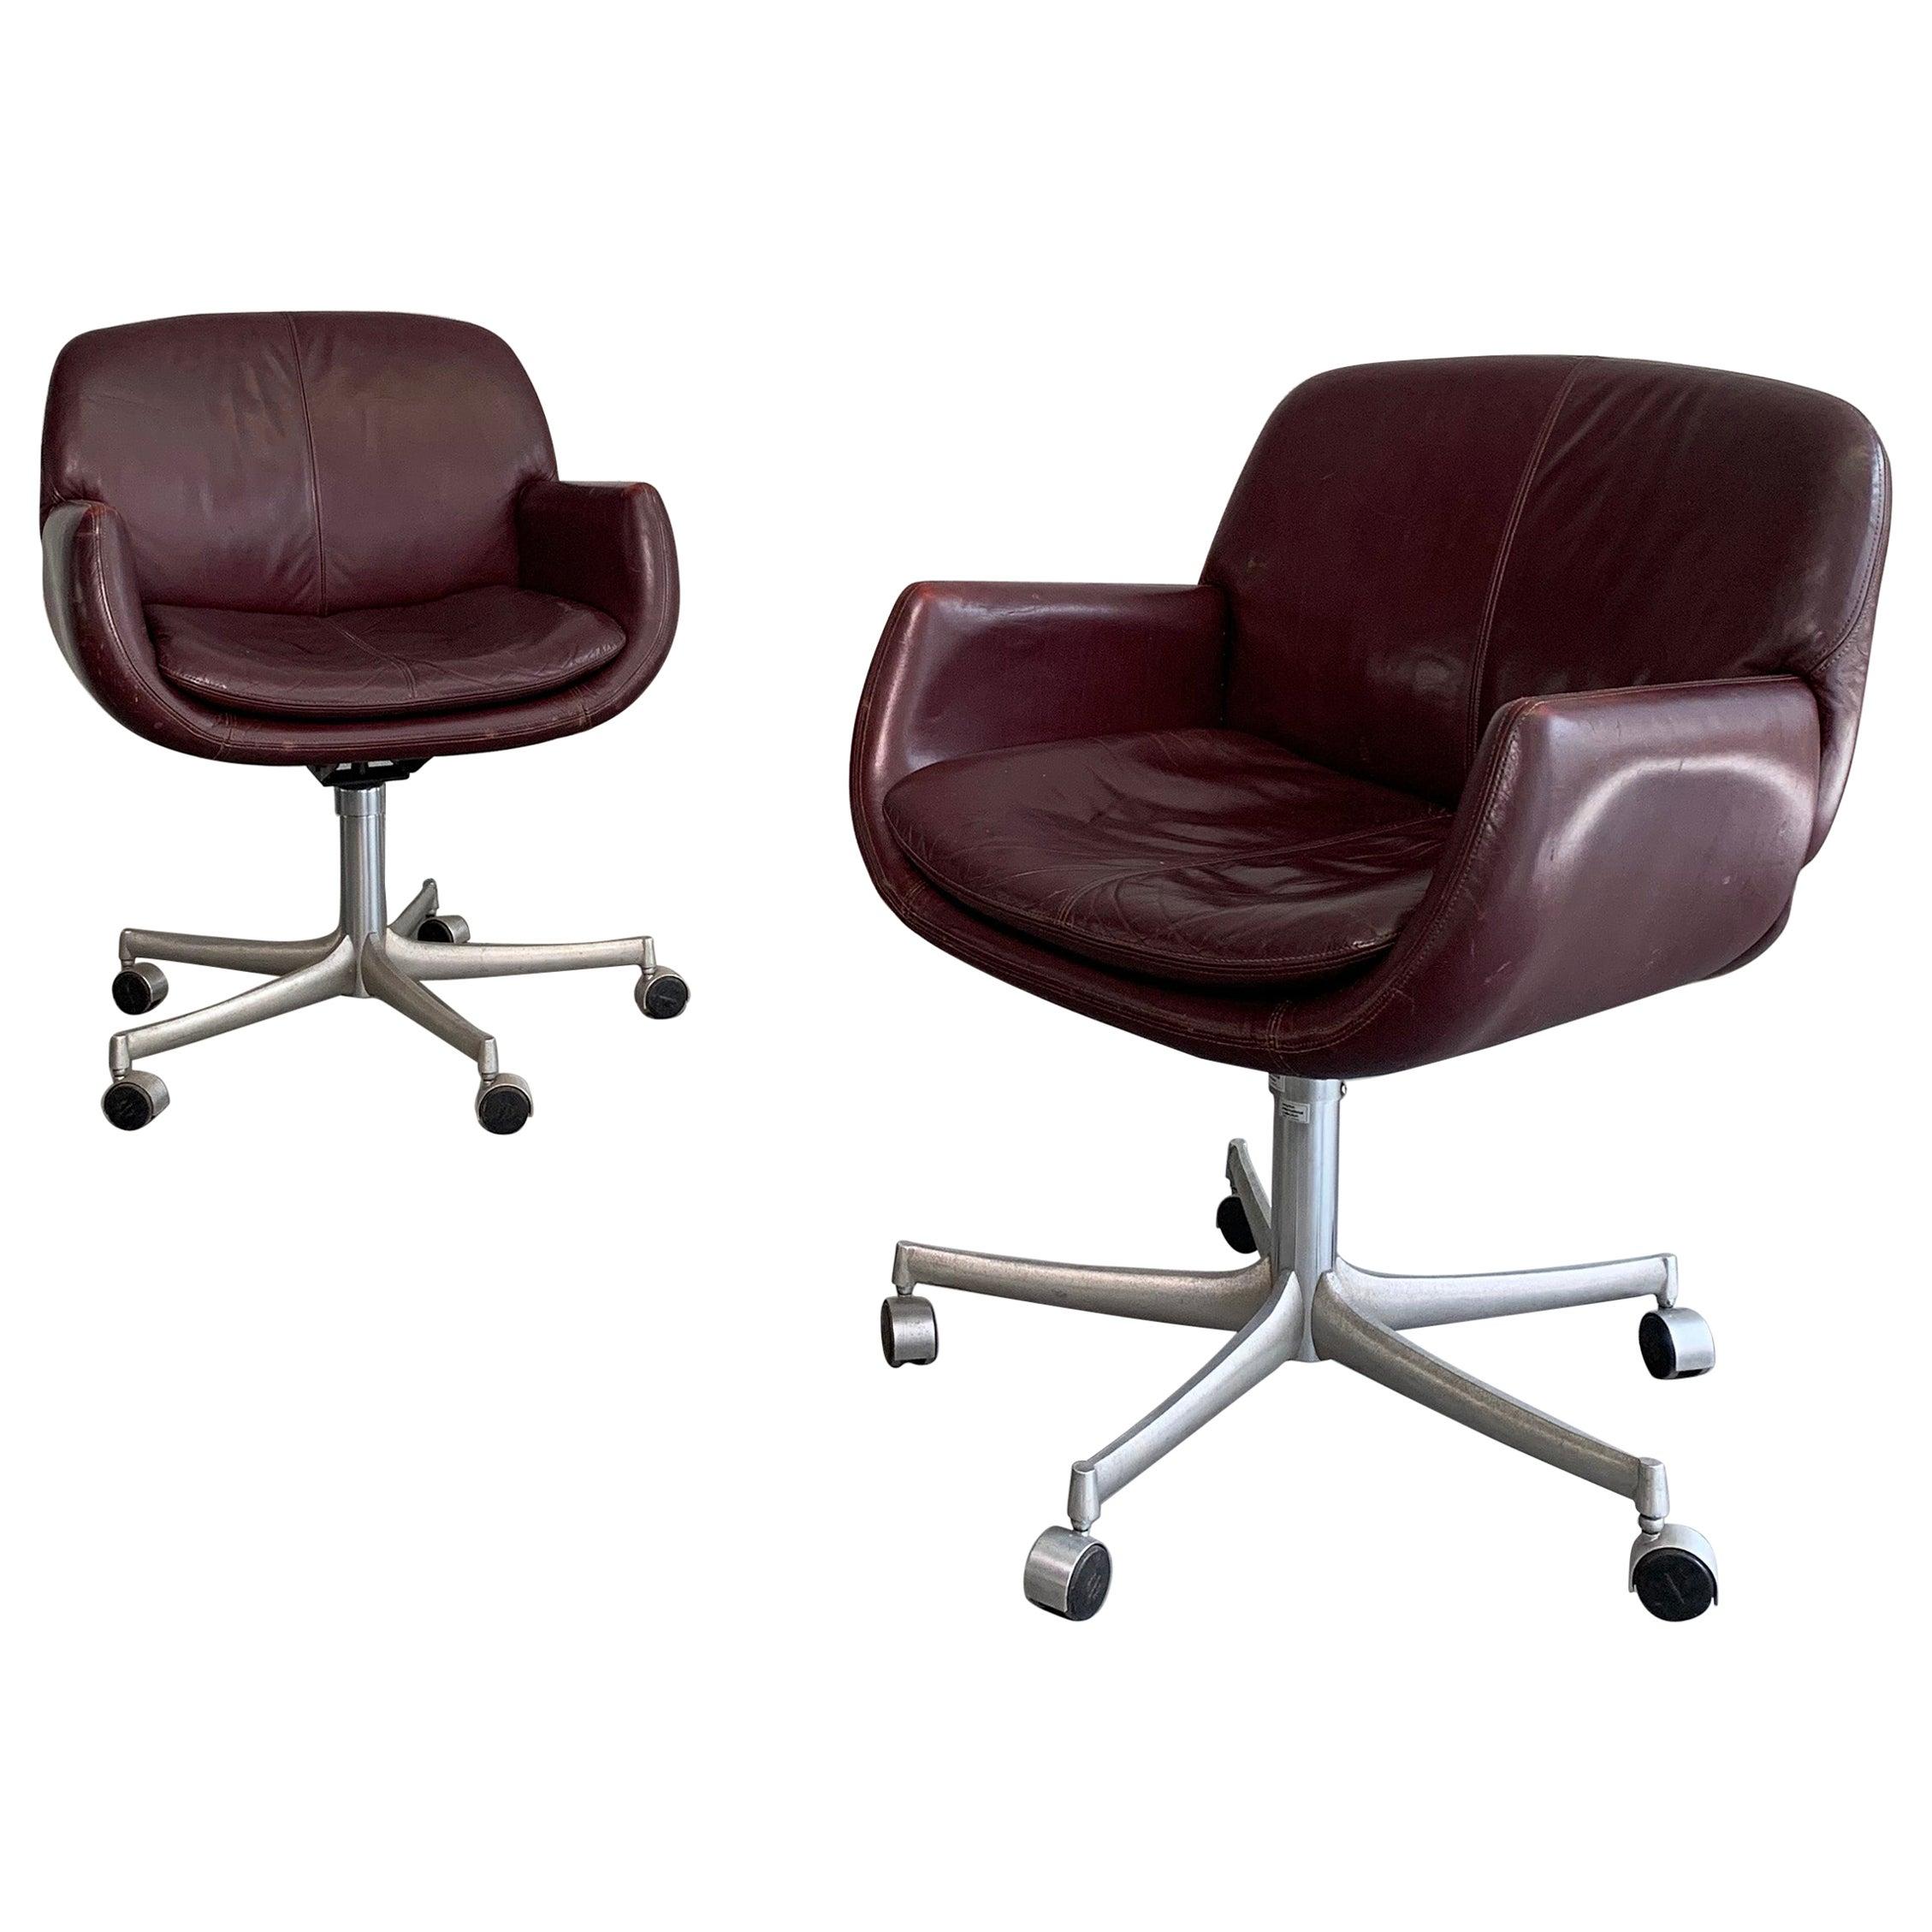 Pair of Mid-Century Modern Leather Office Swivel Armchairs